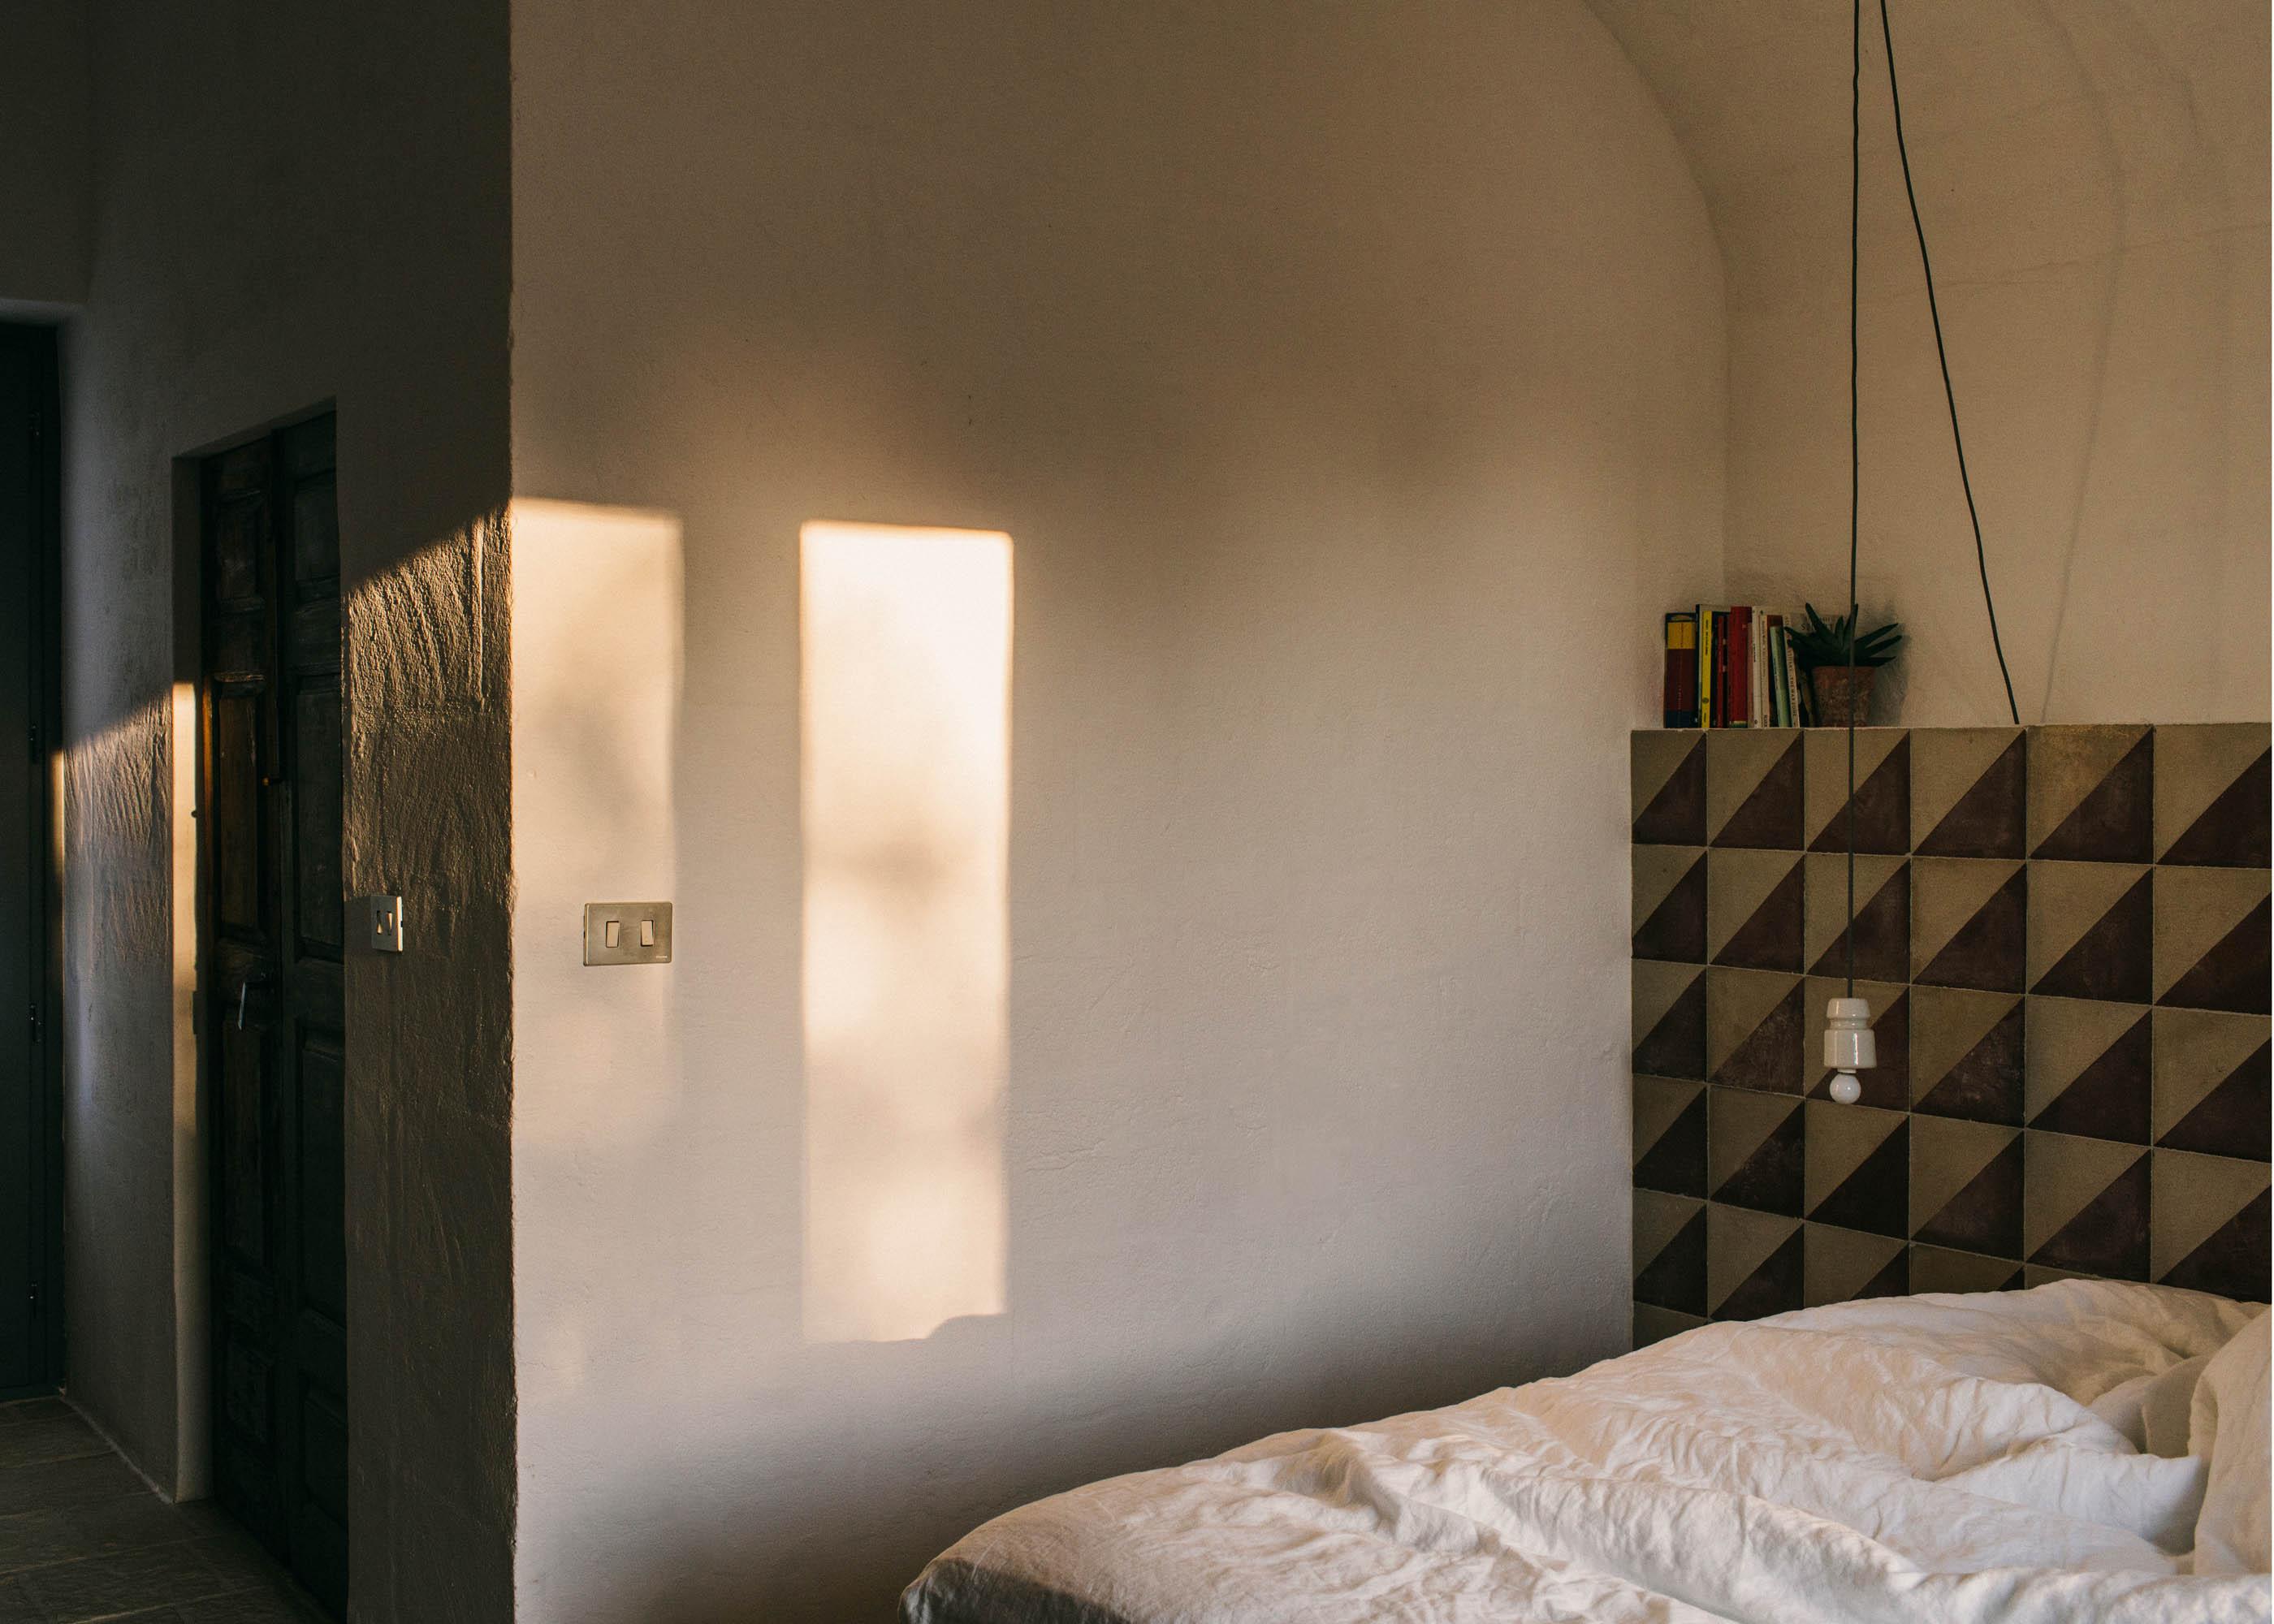 #italy #puglia #masseria #morosseta #hotels #interiors #bedroom